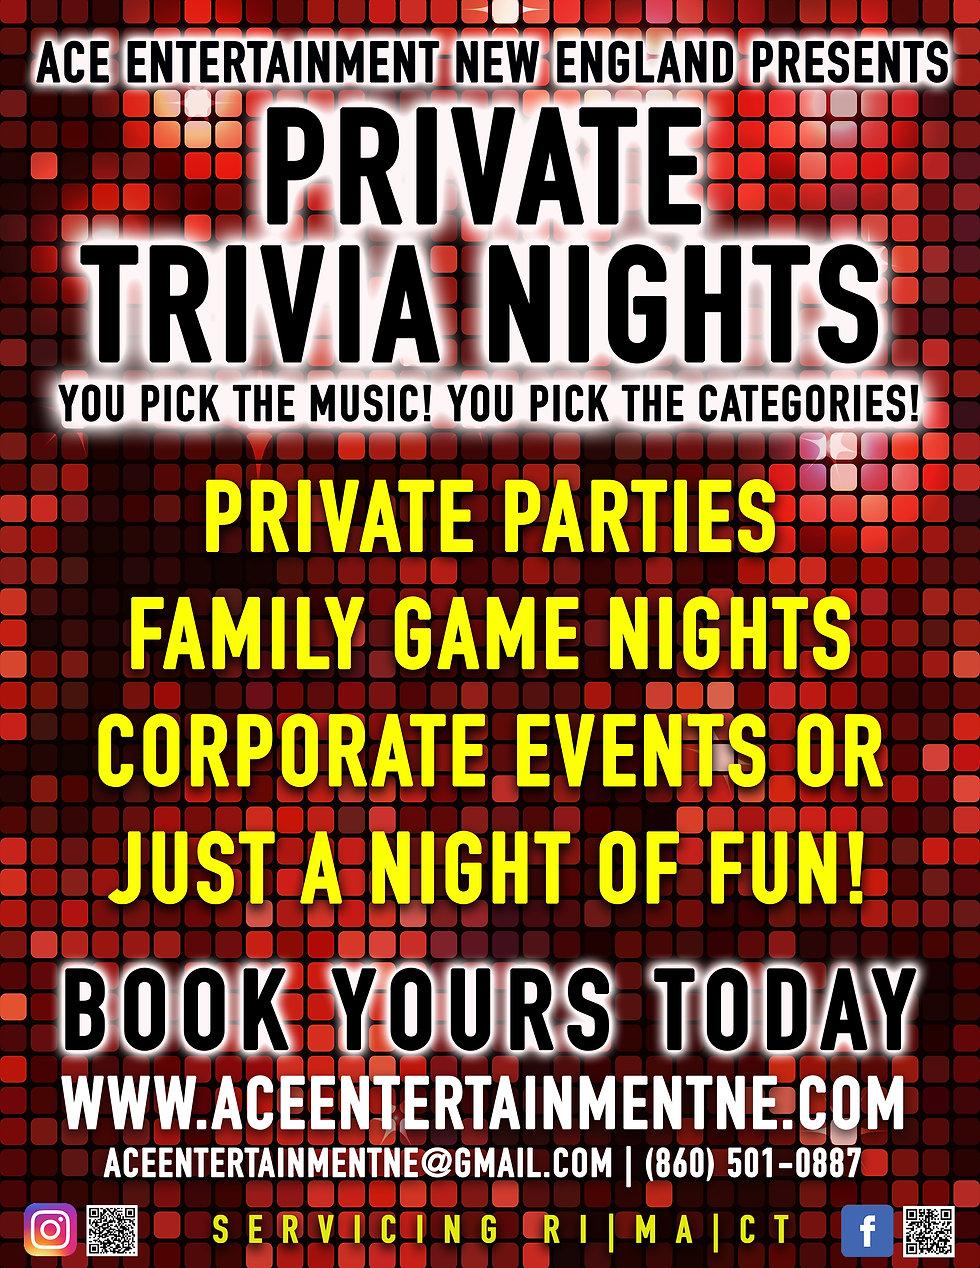 Private Trivia Nights Flyer.jpg